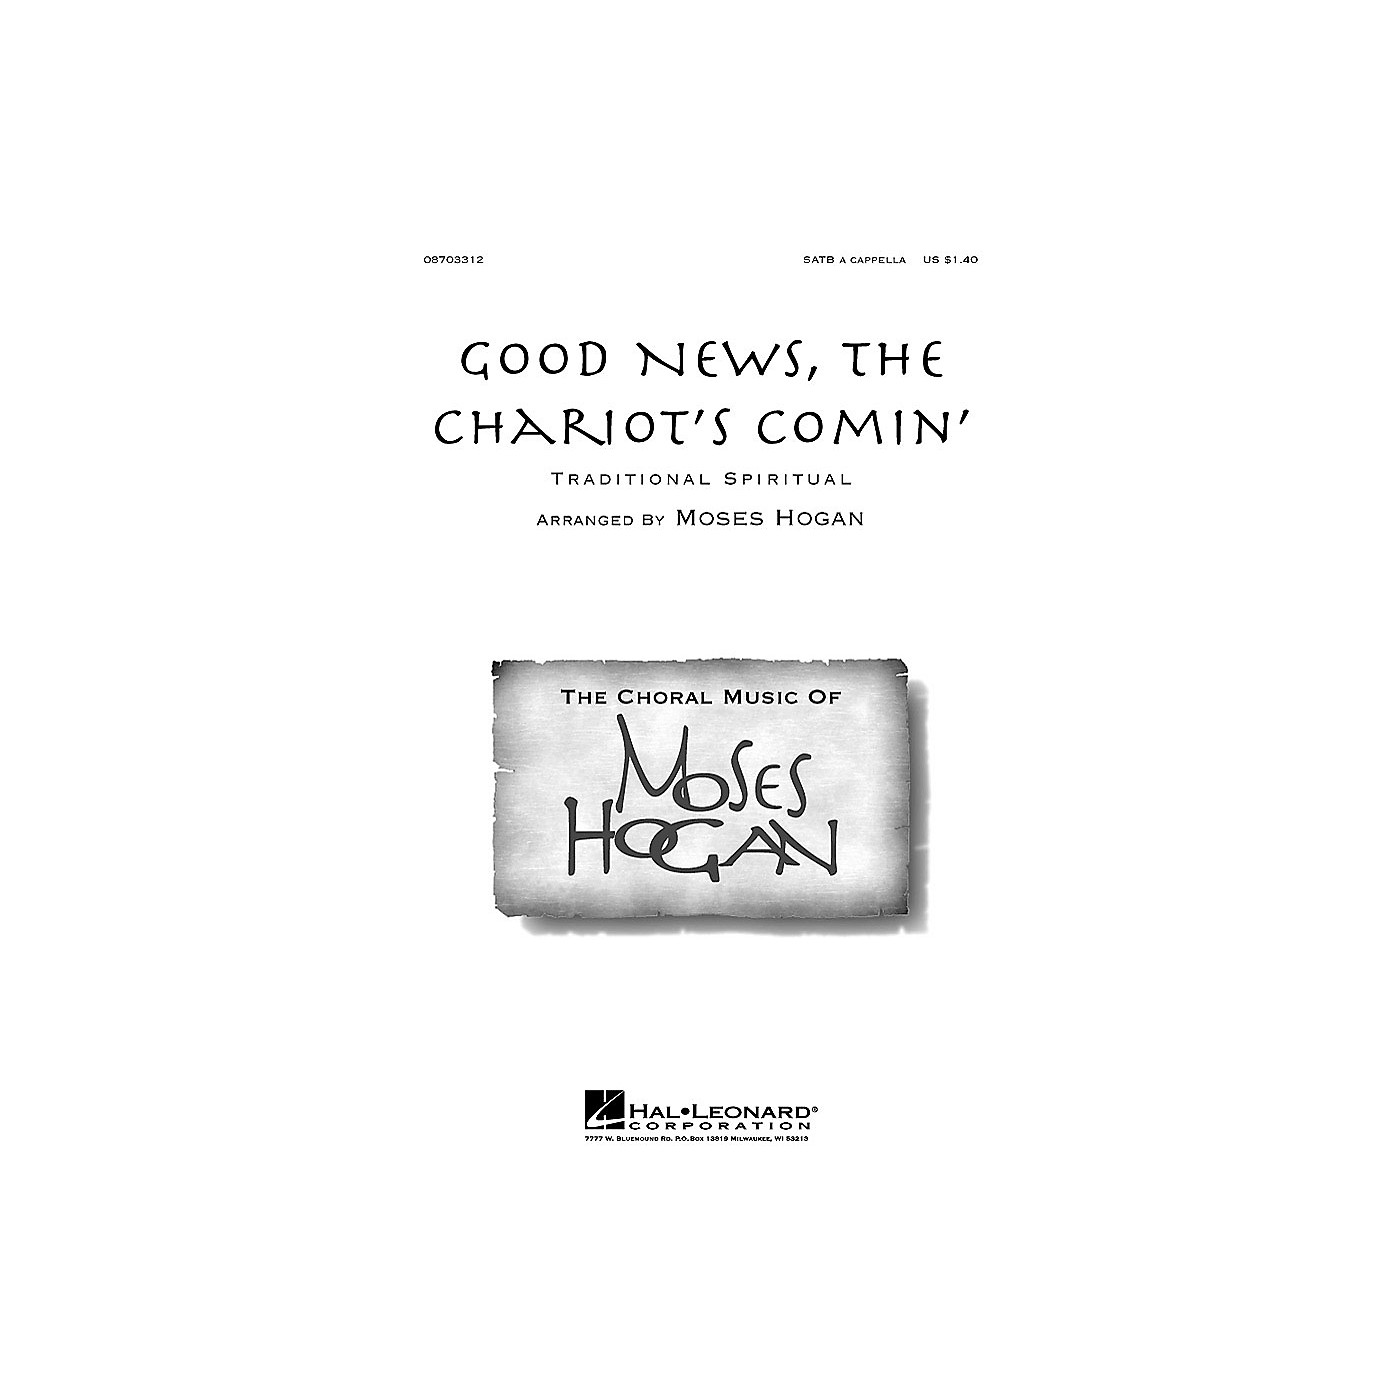 Hal Leonard Good News, the Chariot's Comin' SATB a cappella arranged by M Hogan thumbnail